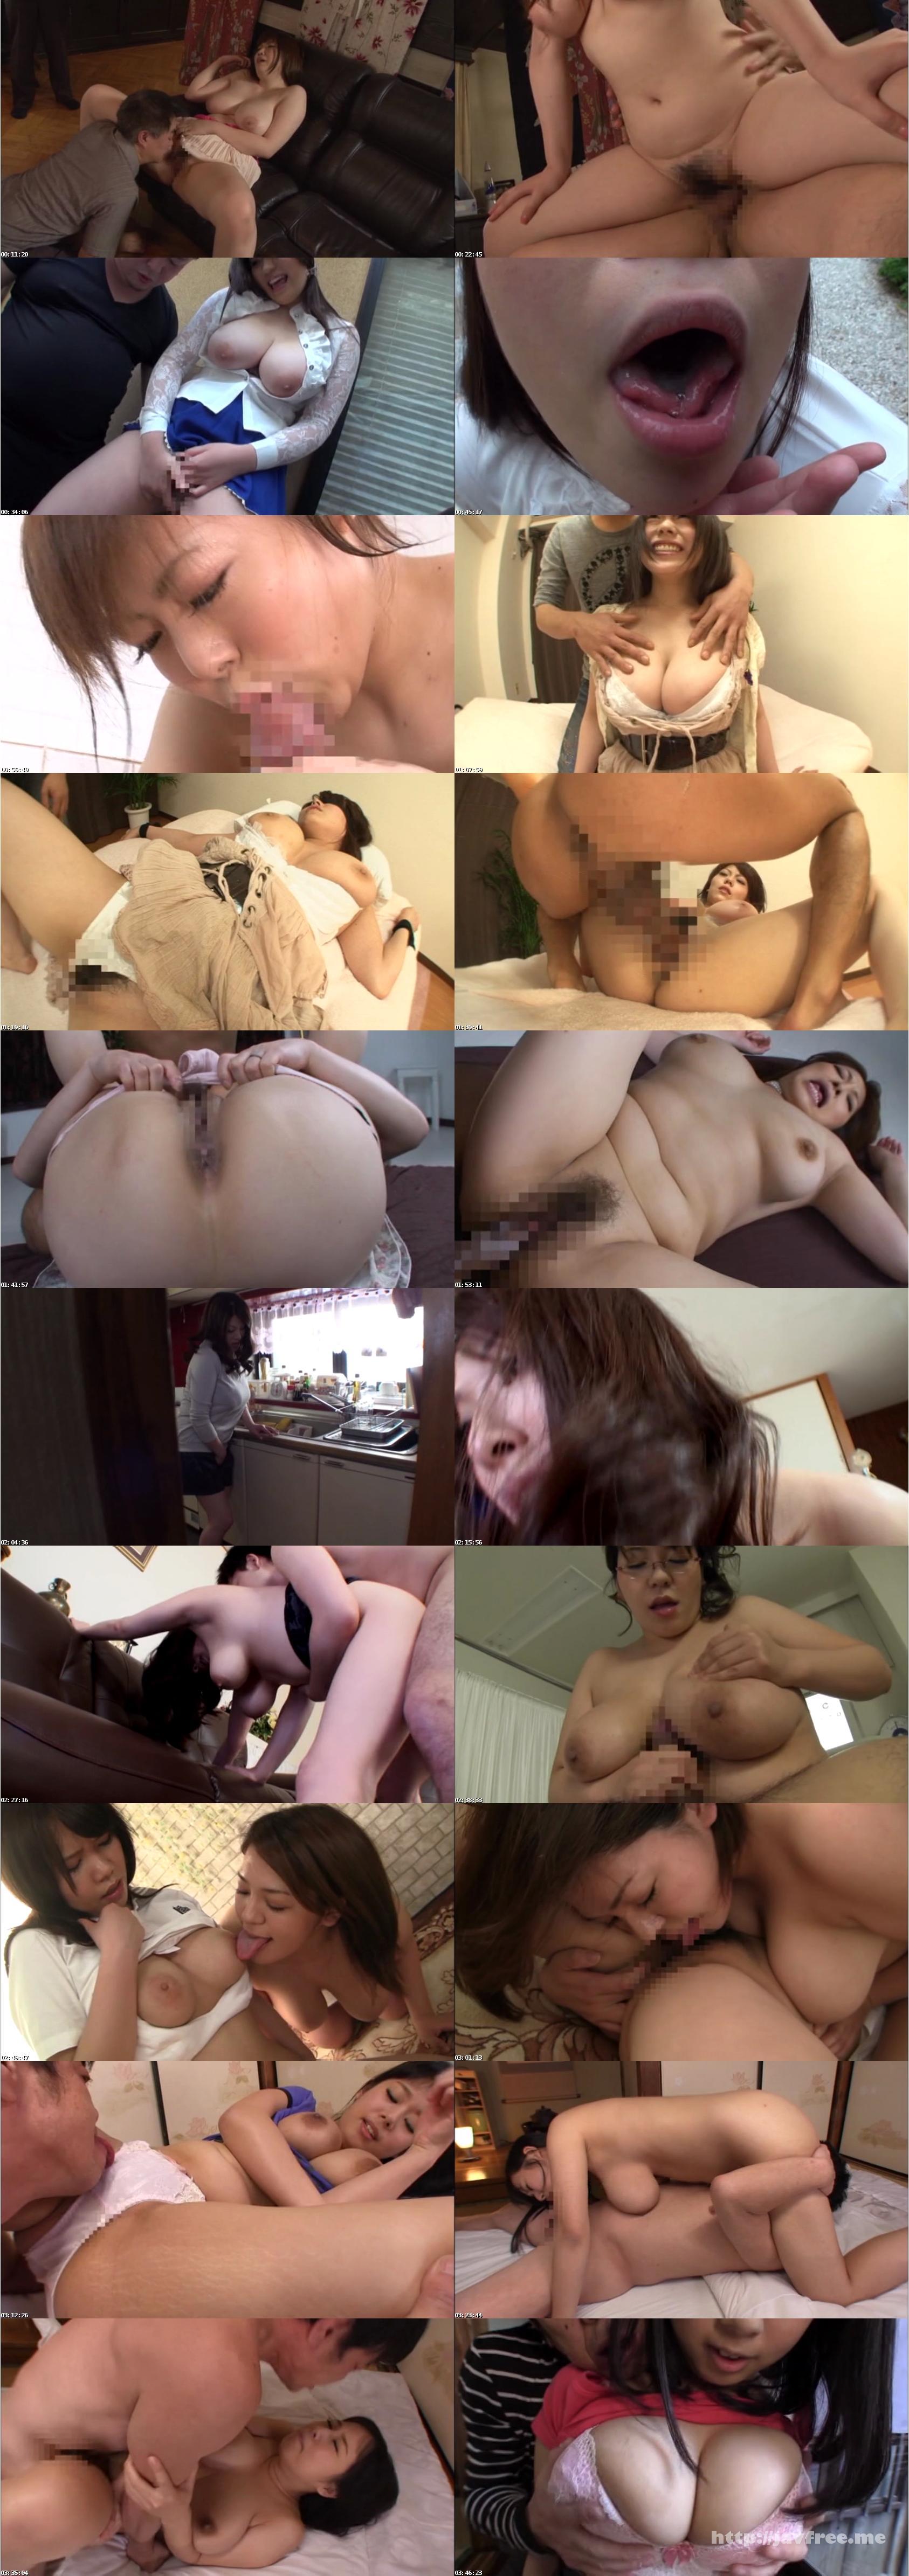 [CADV-550] とにかくデカい乳を持つ10名の爆乳女8時間20選!! - image CADV-550a on https://javfree.me